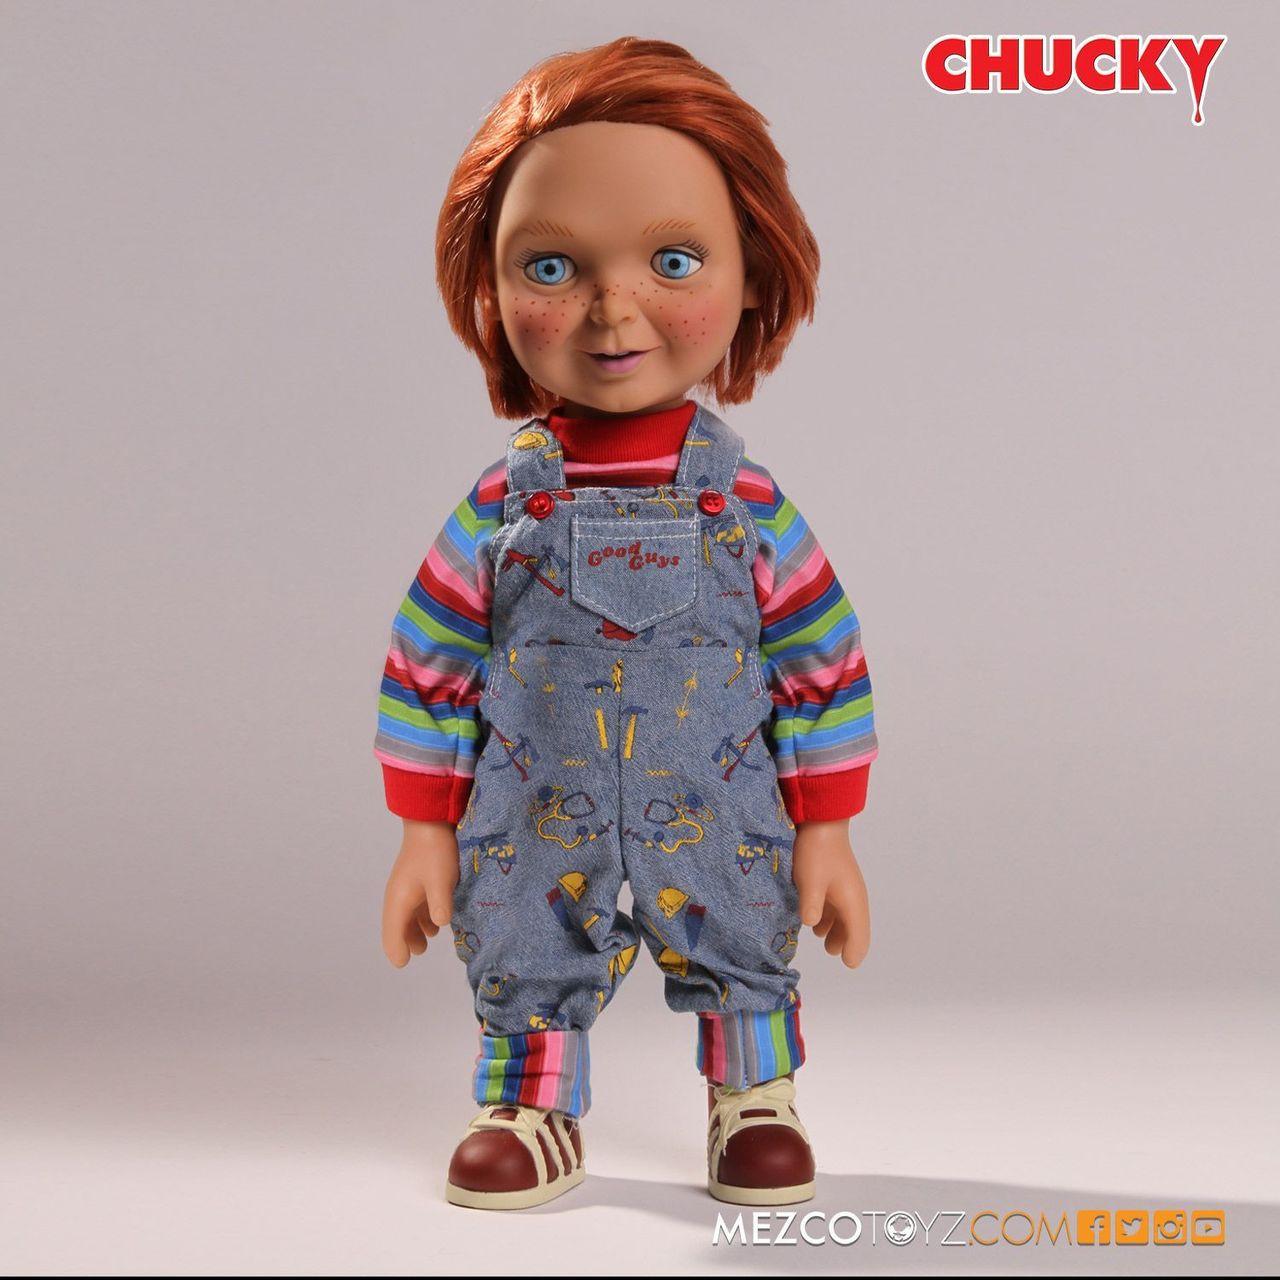 Childs Play Good Guys 15 Chucky Doll Mez78004 696198780048 Ebay